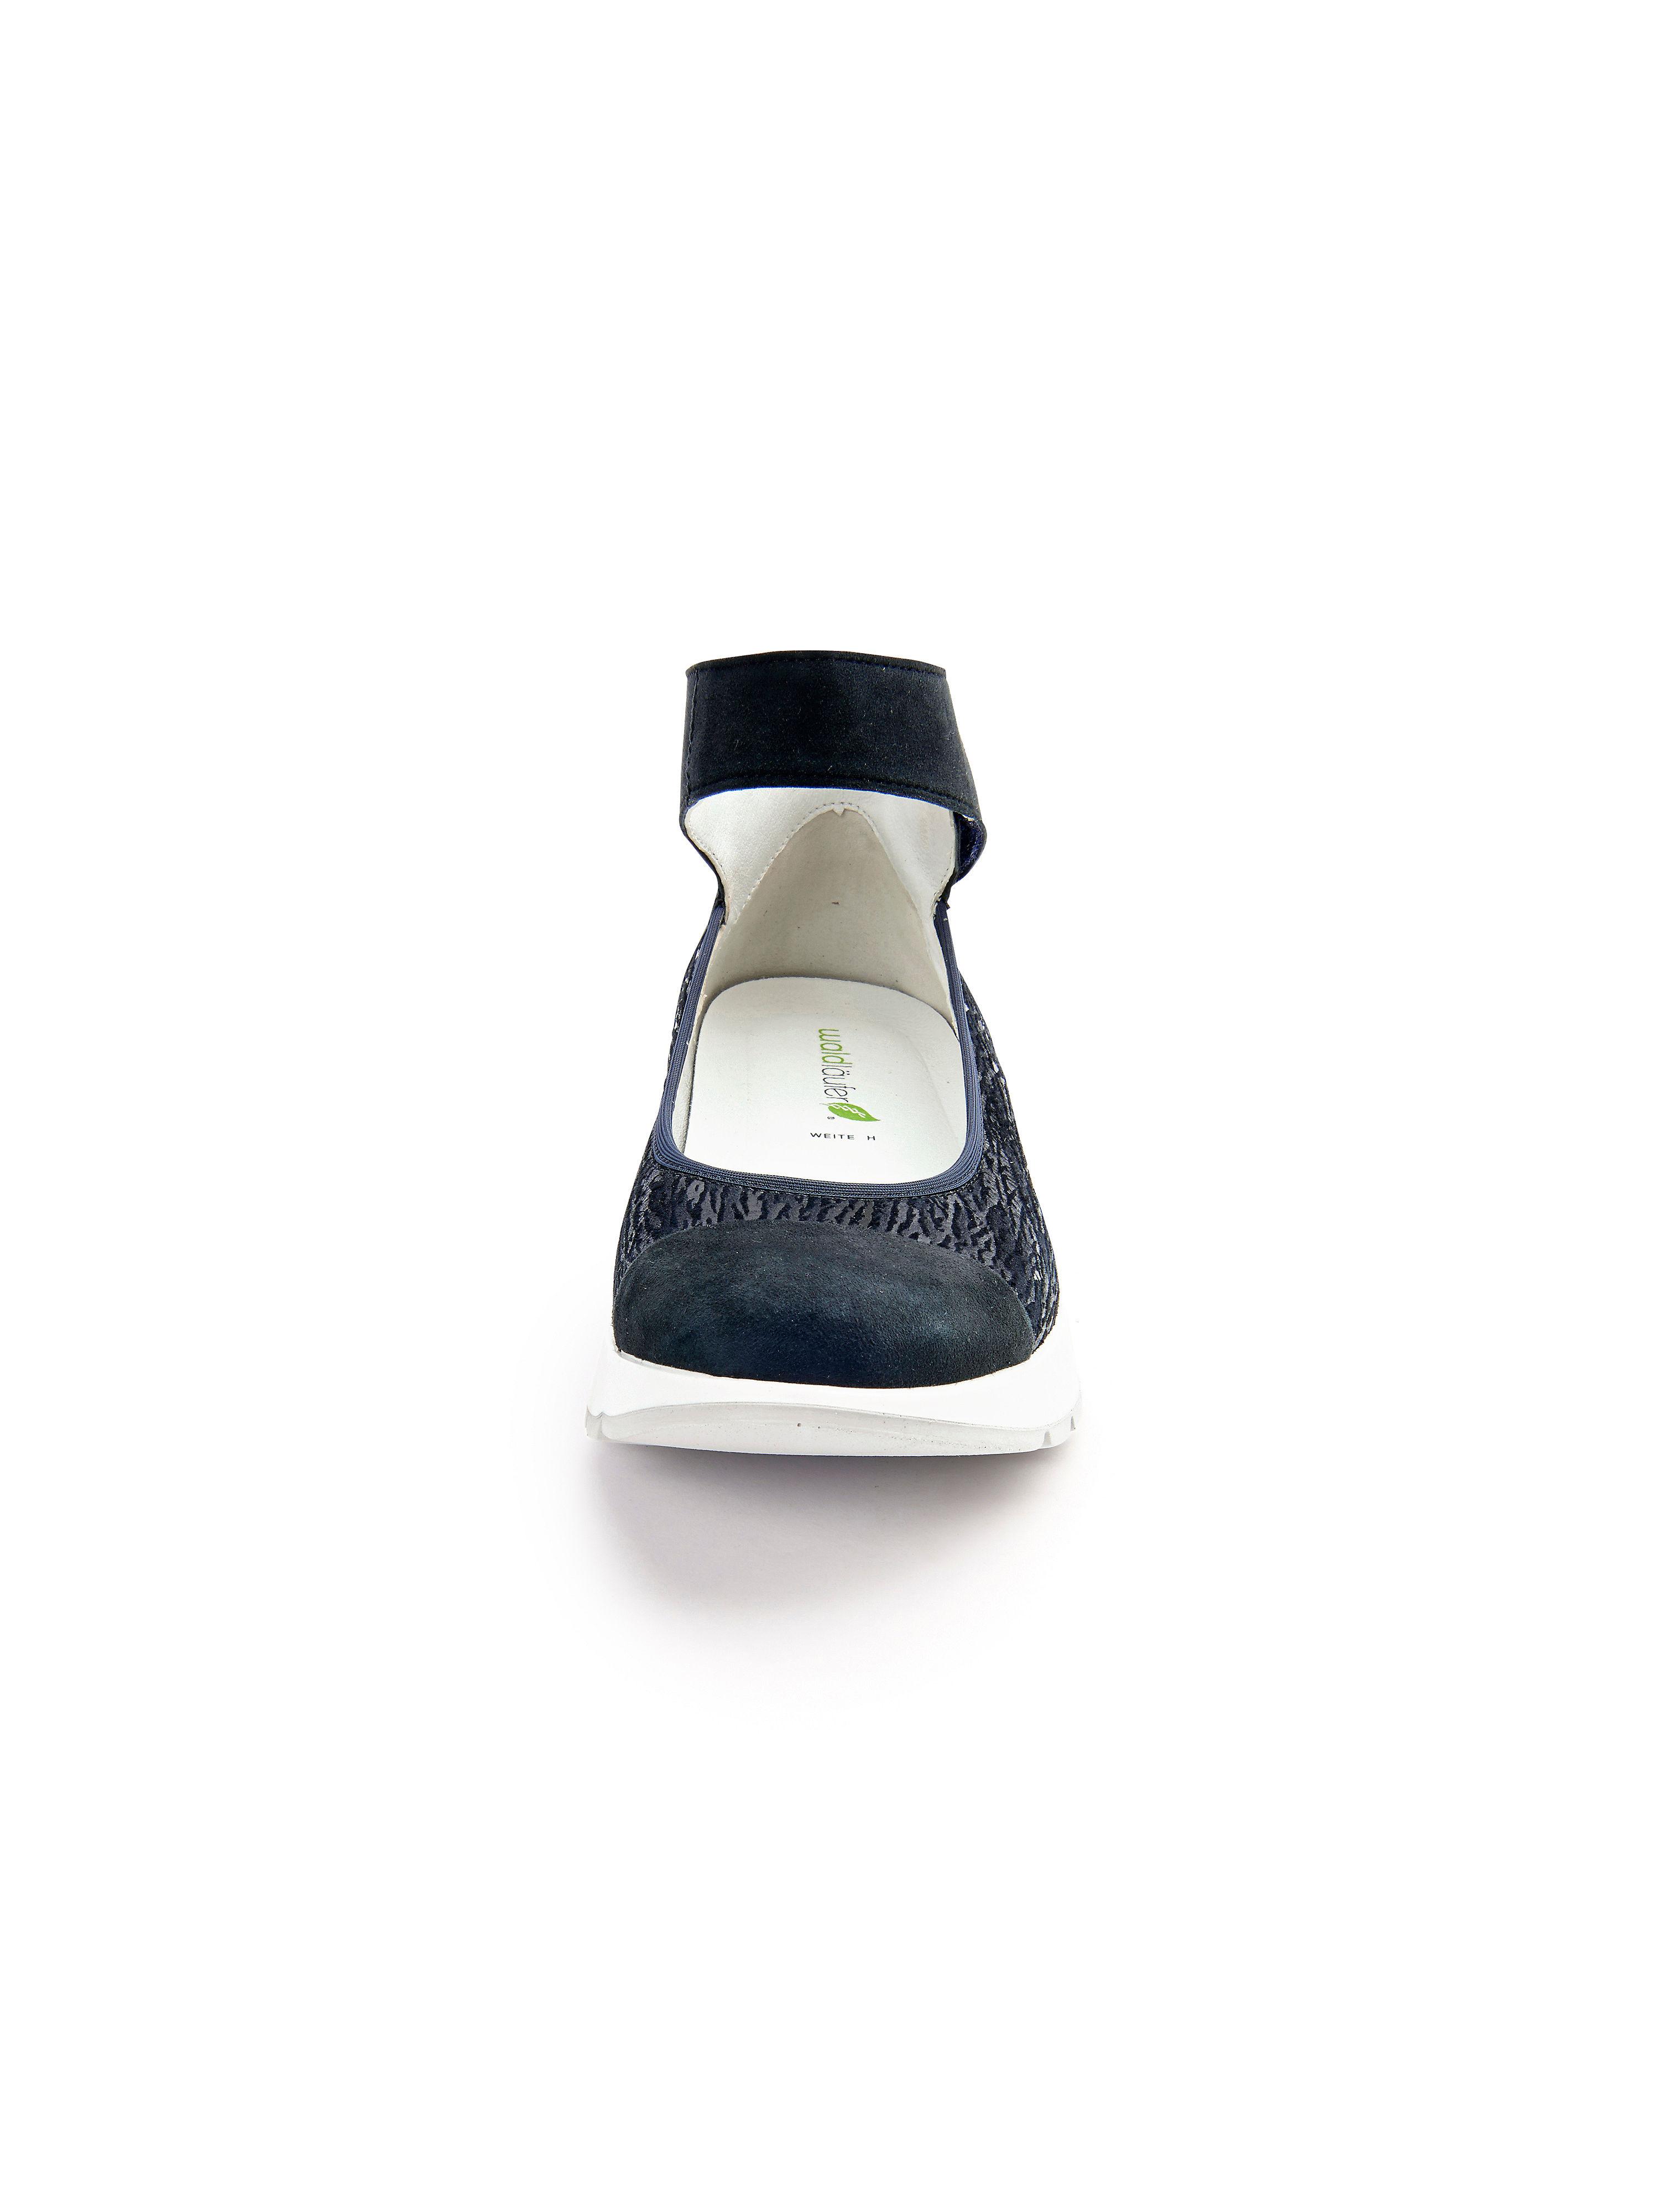 Waldläufer - Ballerina - Hoppy aus 100% Leder - Ballerina Marine Gute Qualität beliebte Schuhe ce2f7e